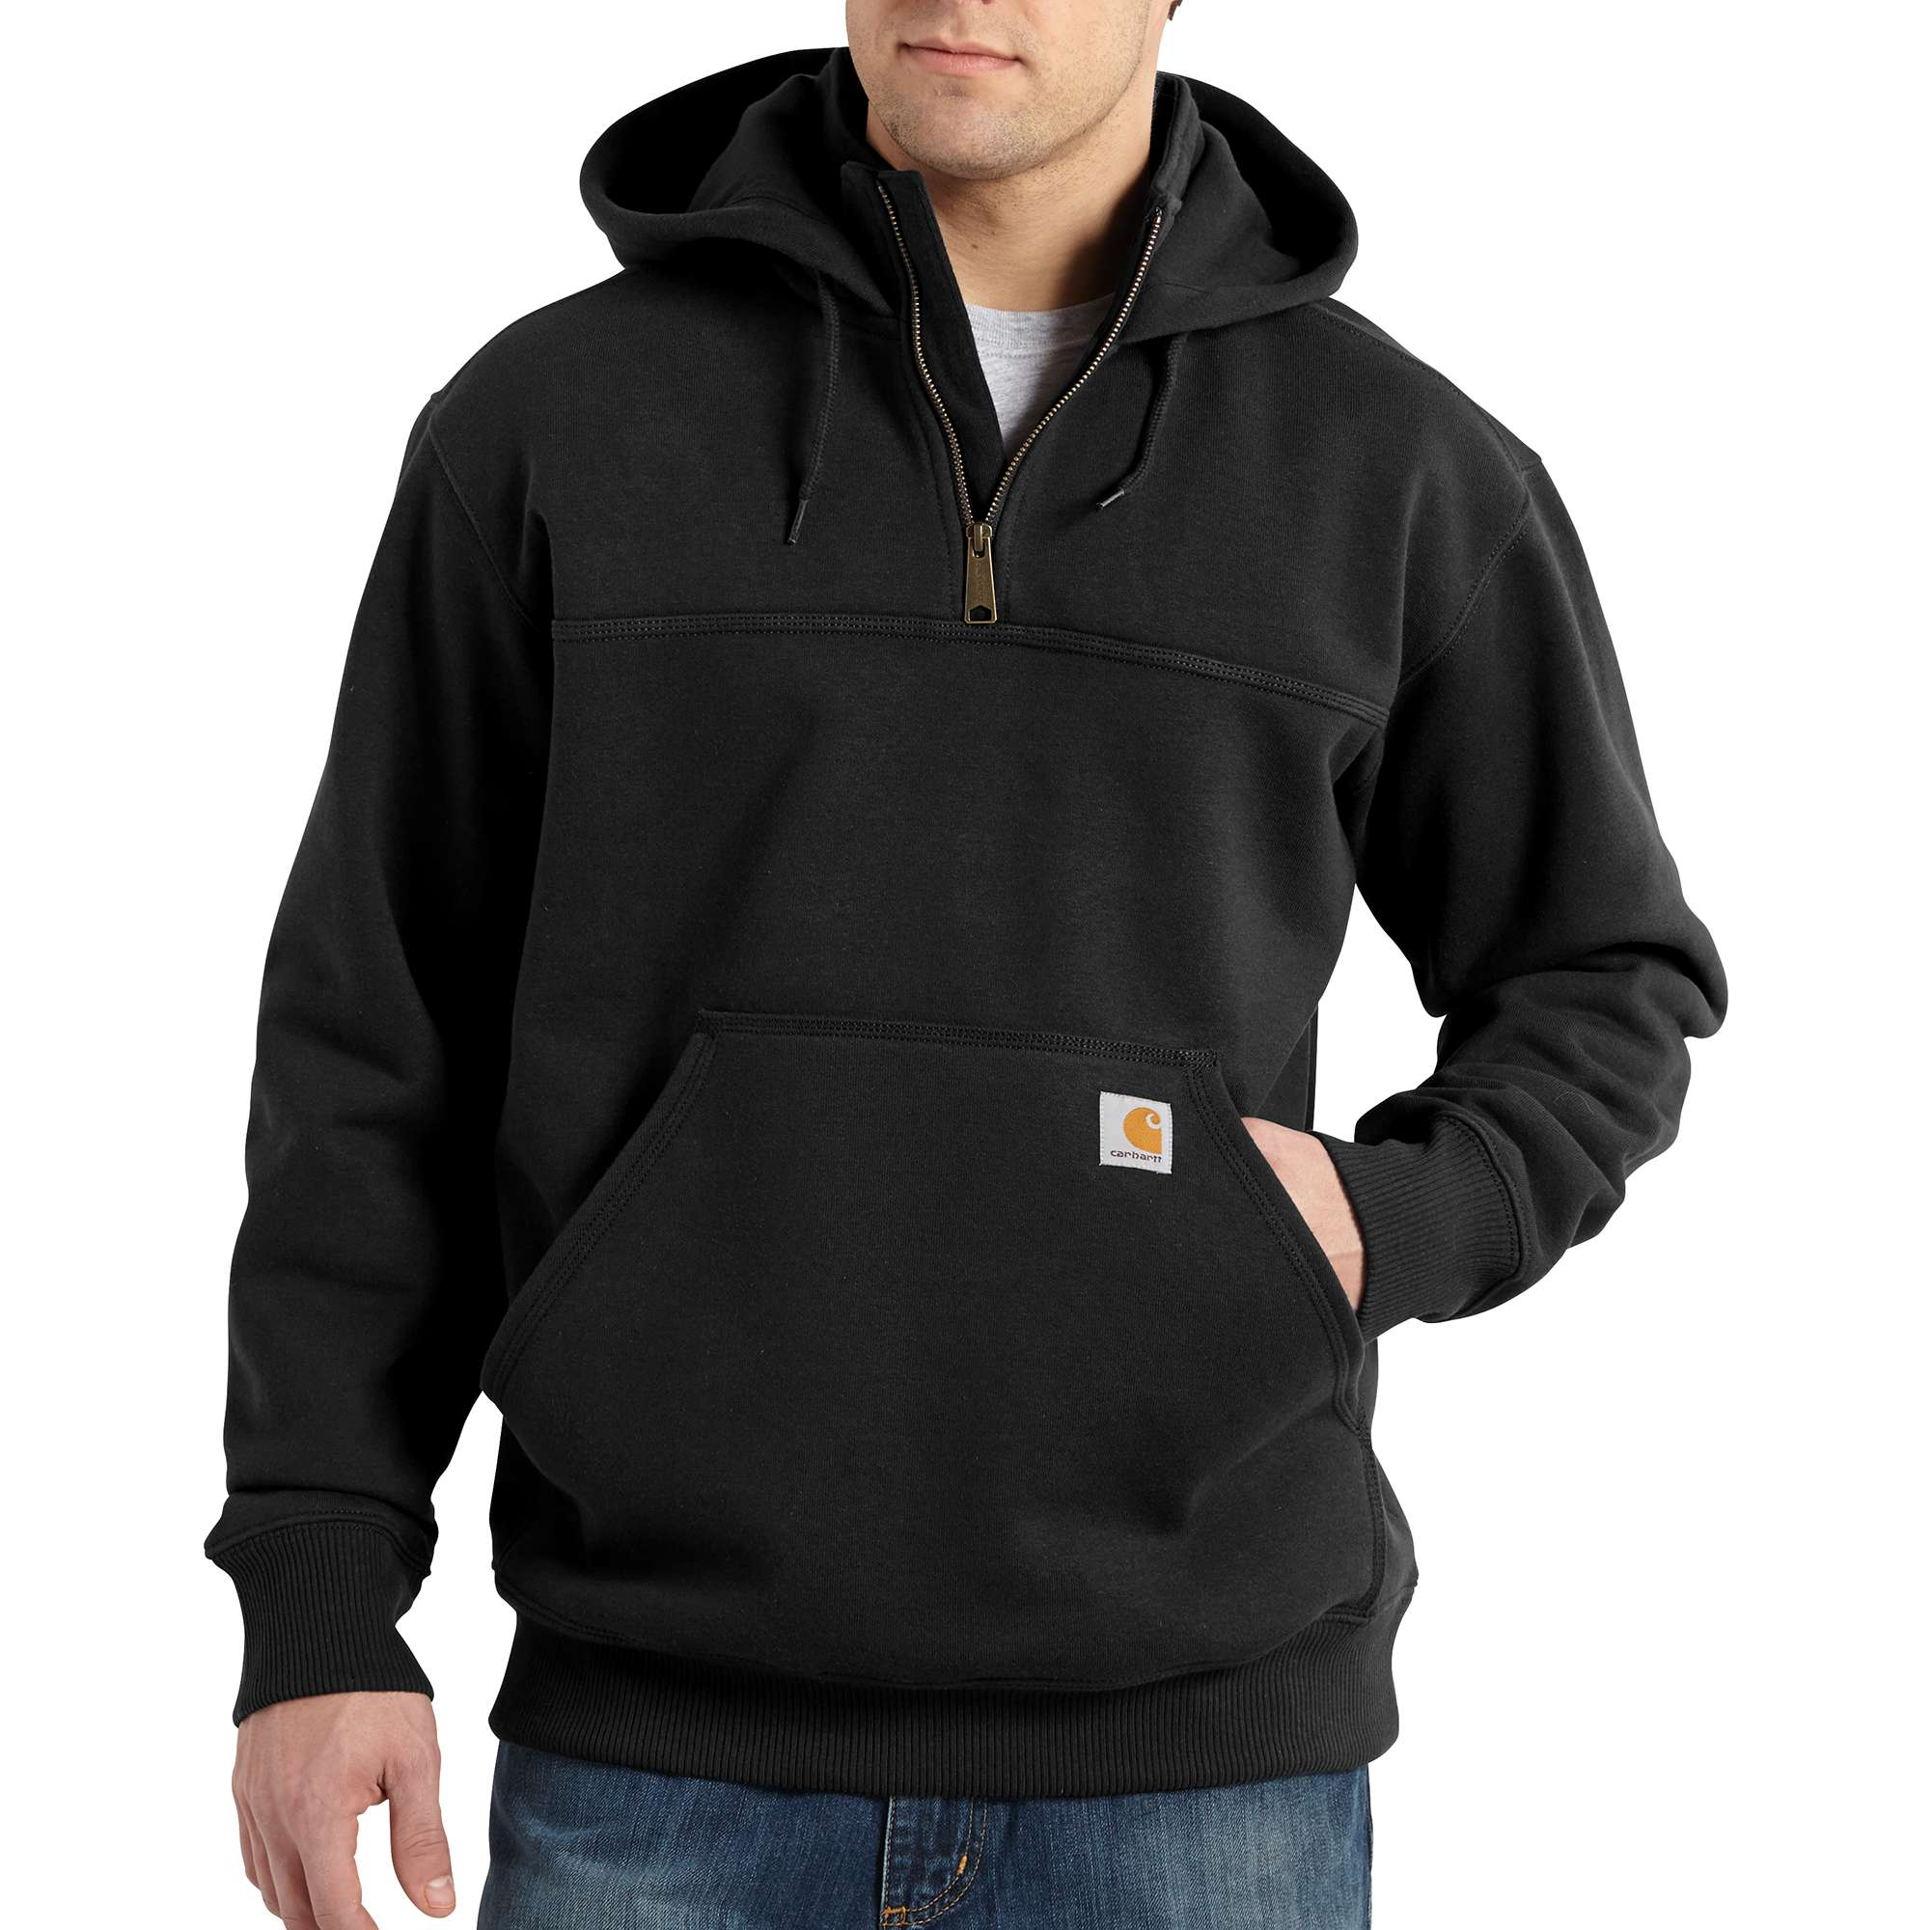 Men's Raindefender Paxton Heavyweight Hooded Zip Mock Sweatshirt, Black, swatch